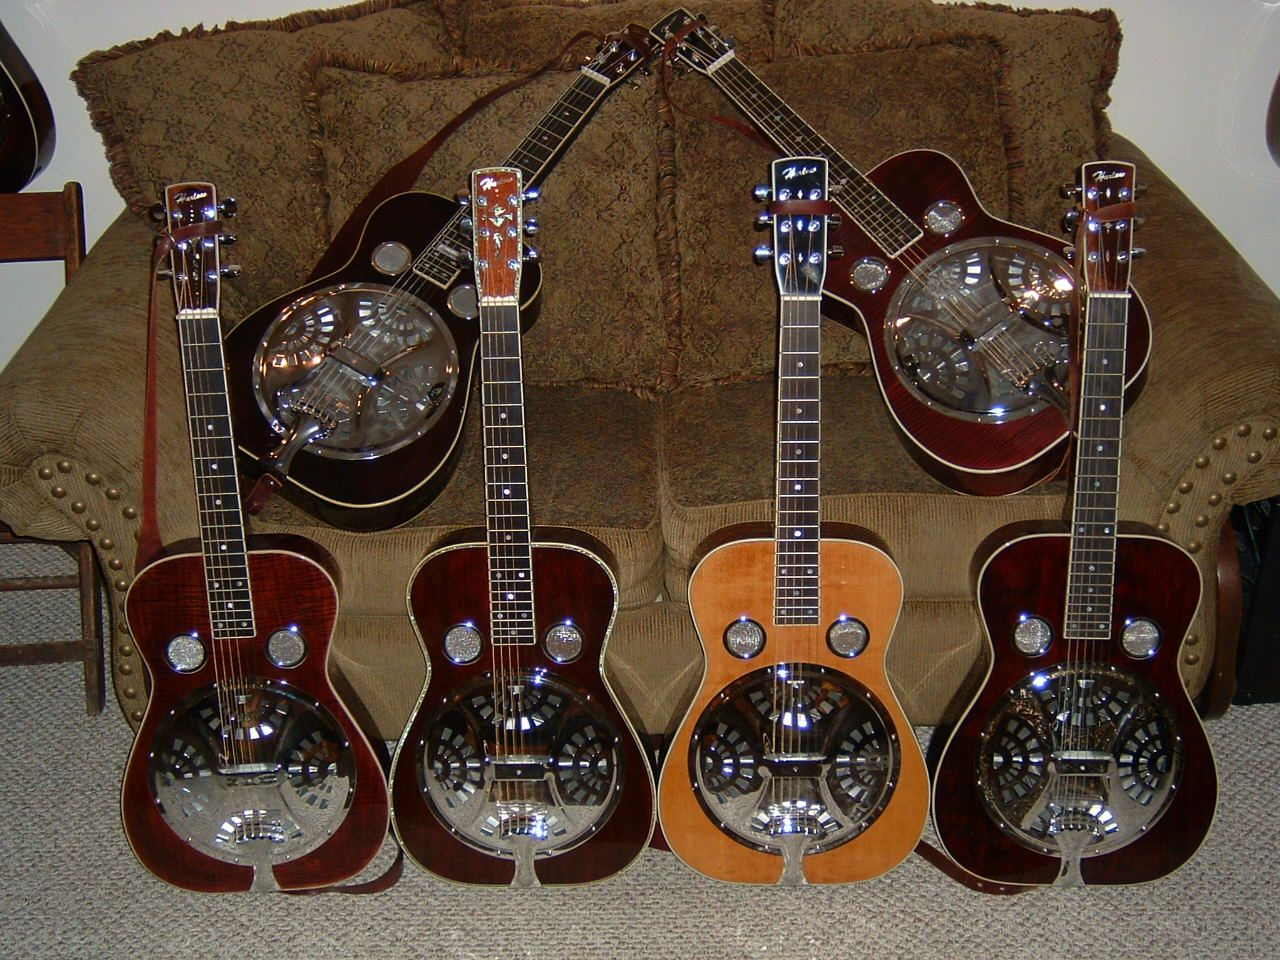 harlow resonator guitars instruments pinterest. Black Bedroom Furniture Sets. Home Design Ideas